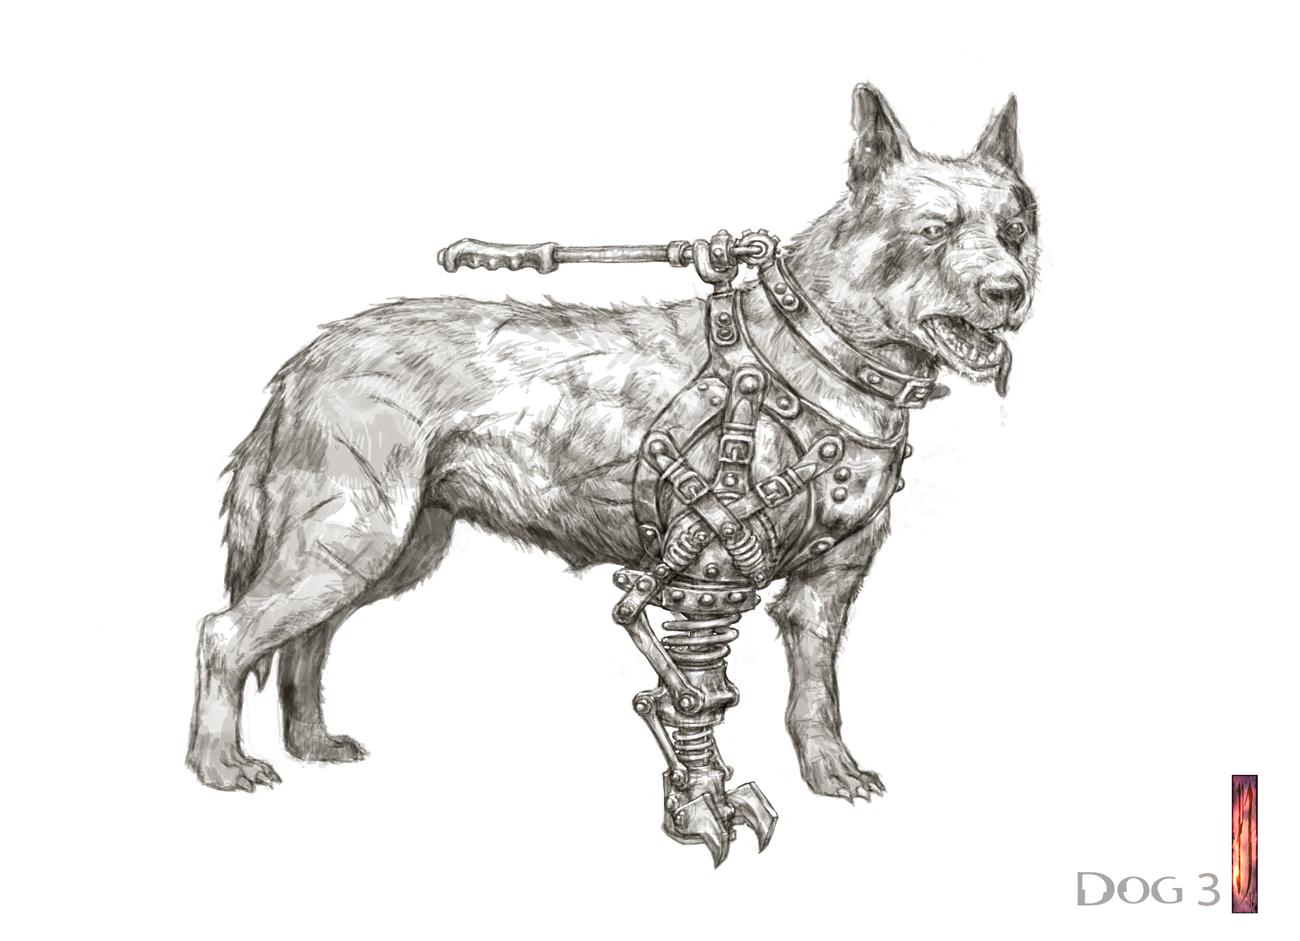 Dog version 3